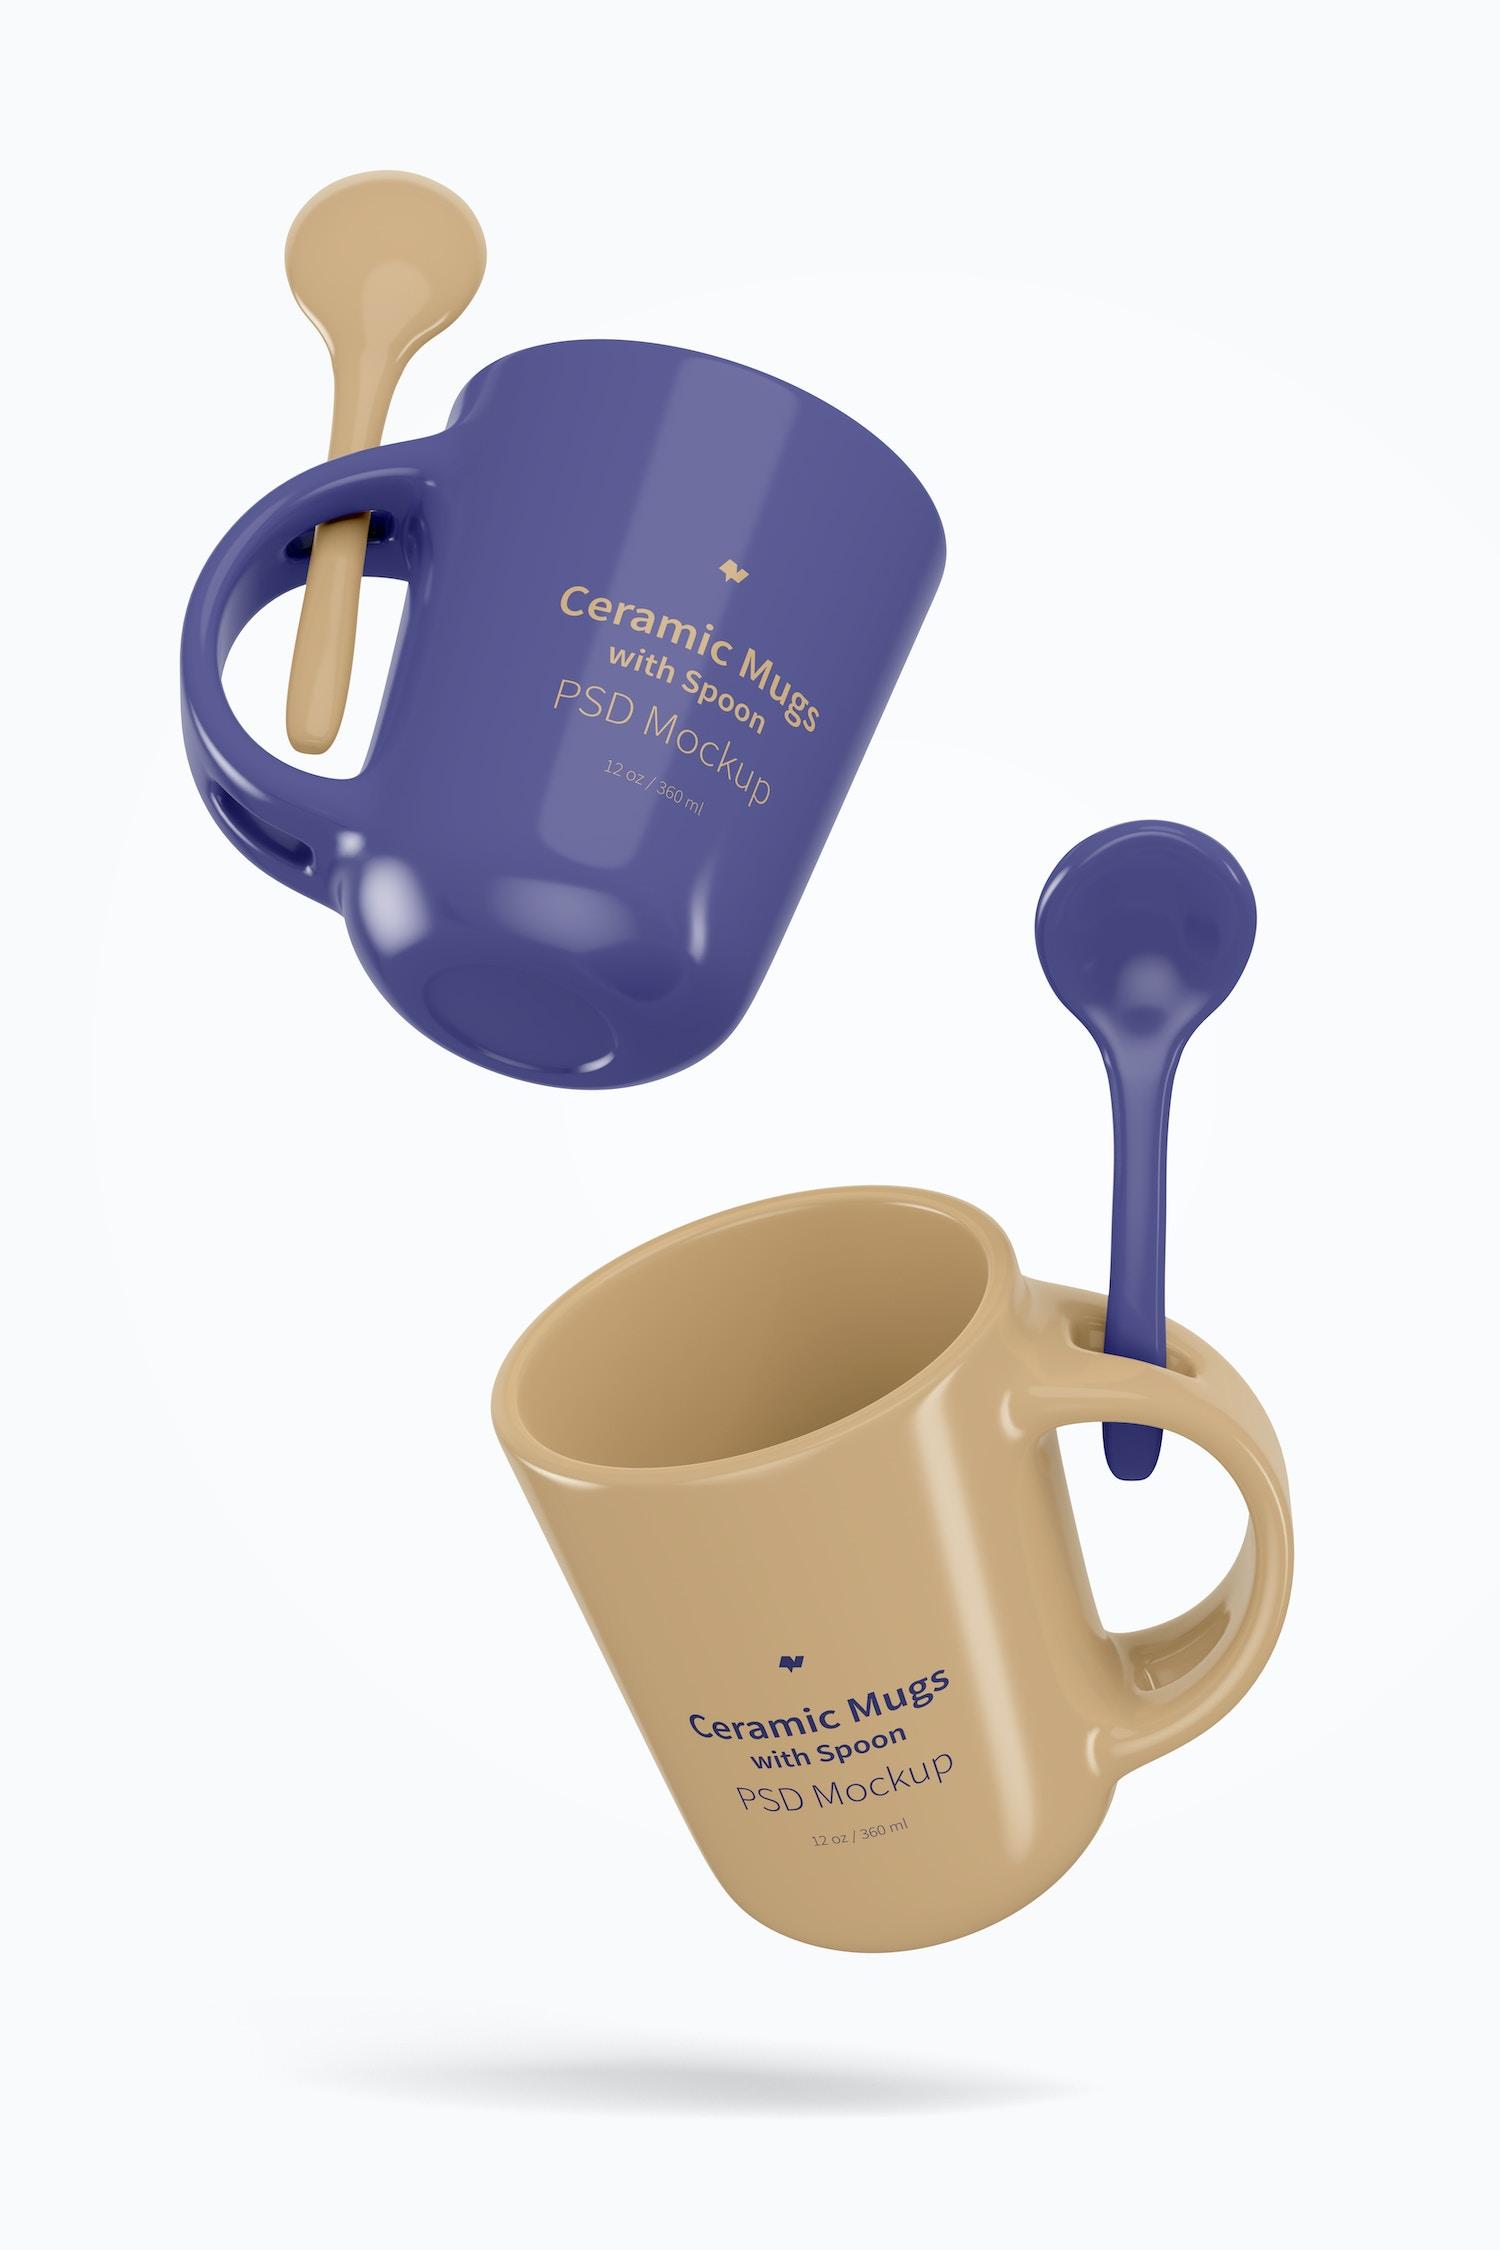 12 oz Ceramic Mug with Spoon Mockup, Floating